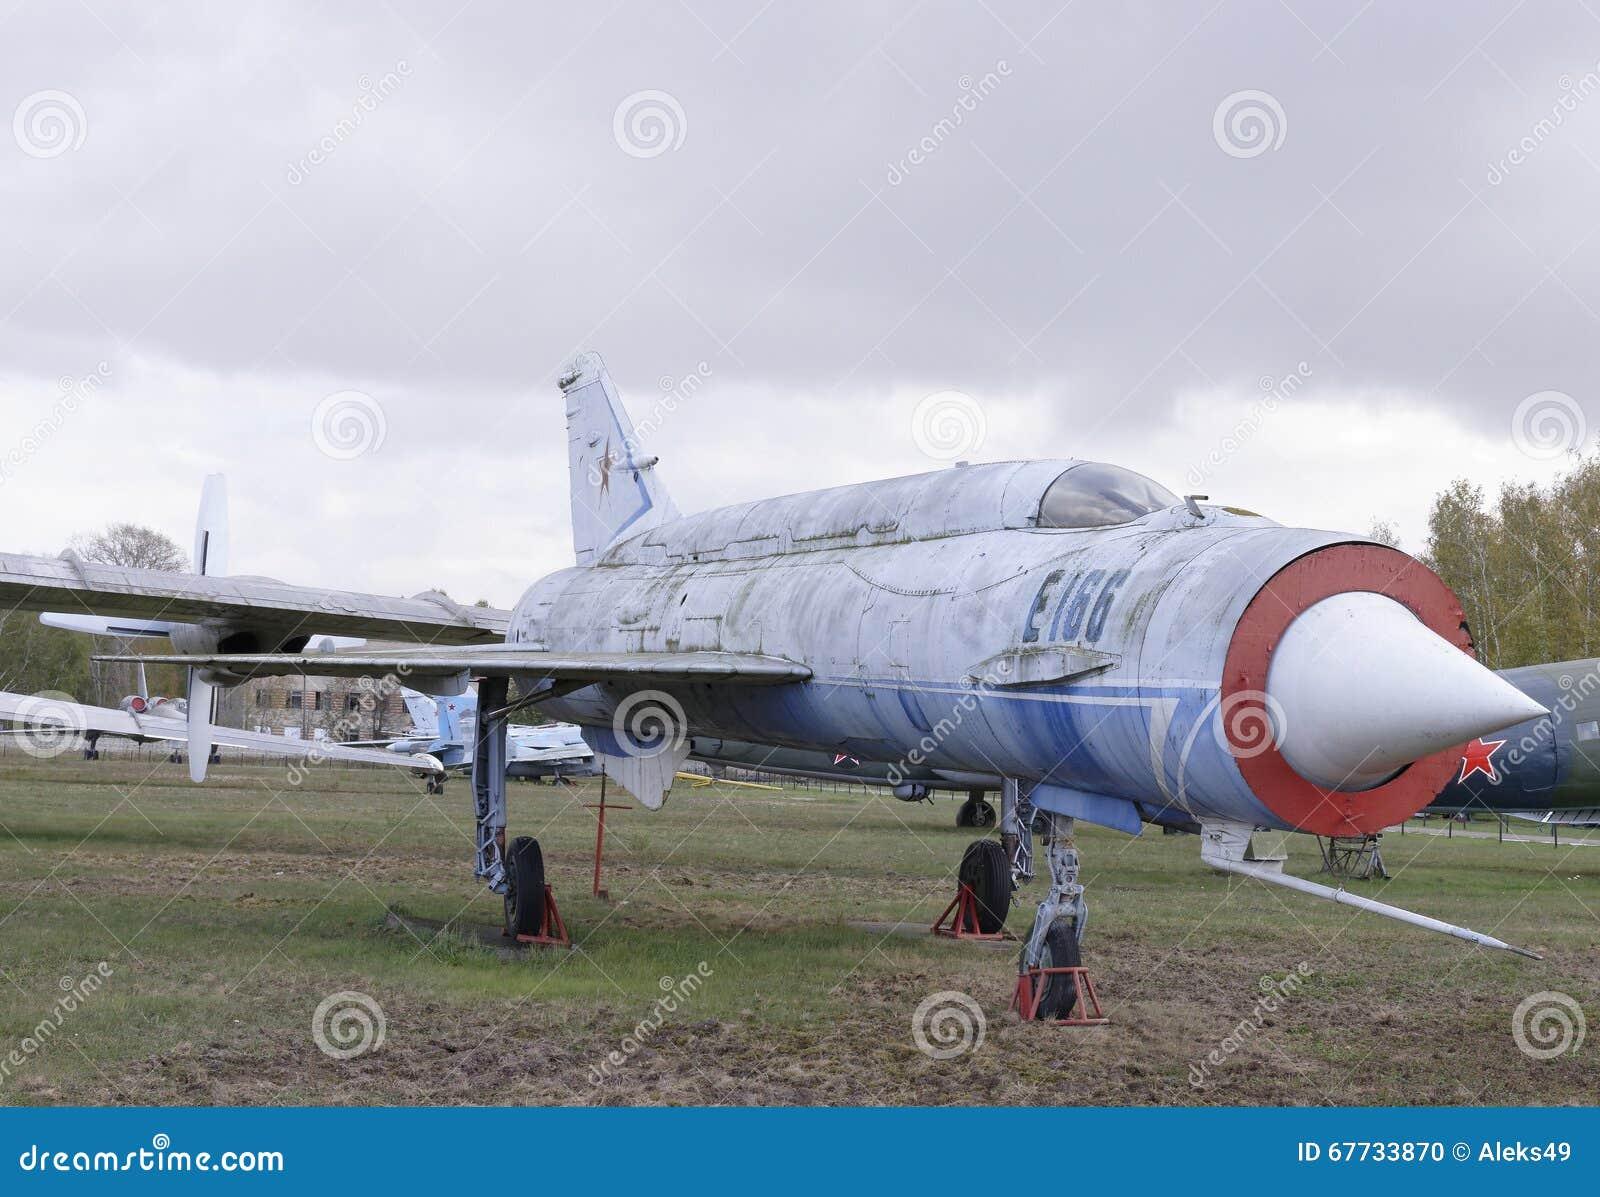 e-experimental-aircraft-monino-moscow-re